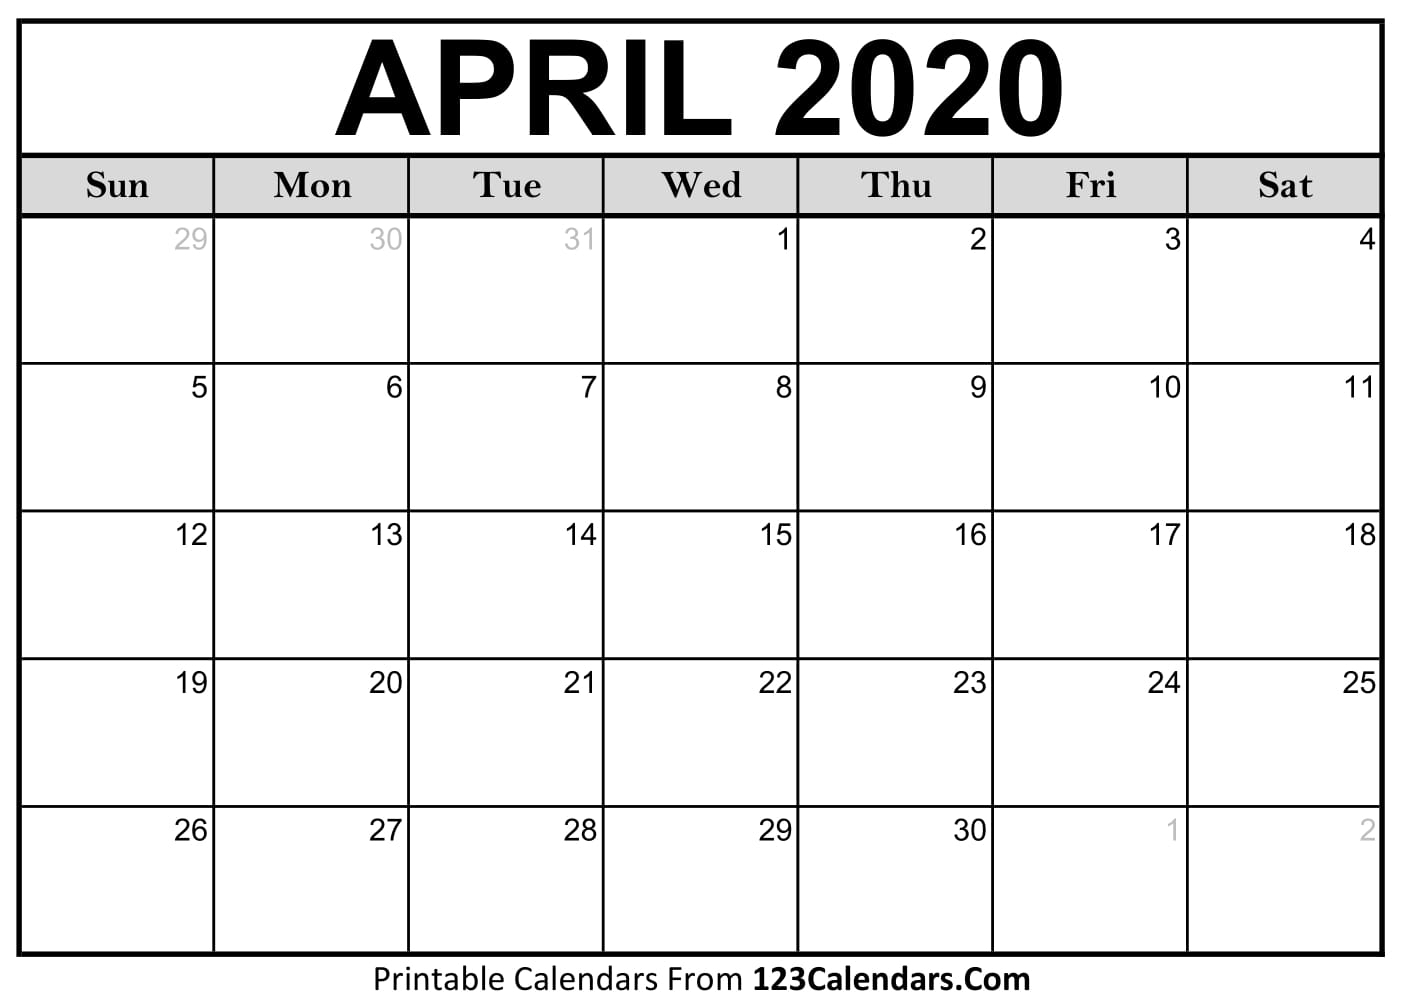 Https://idlewildfurnishing/2020-Employee-Attendance